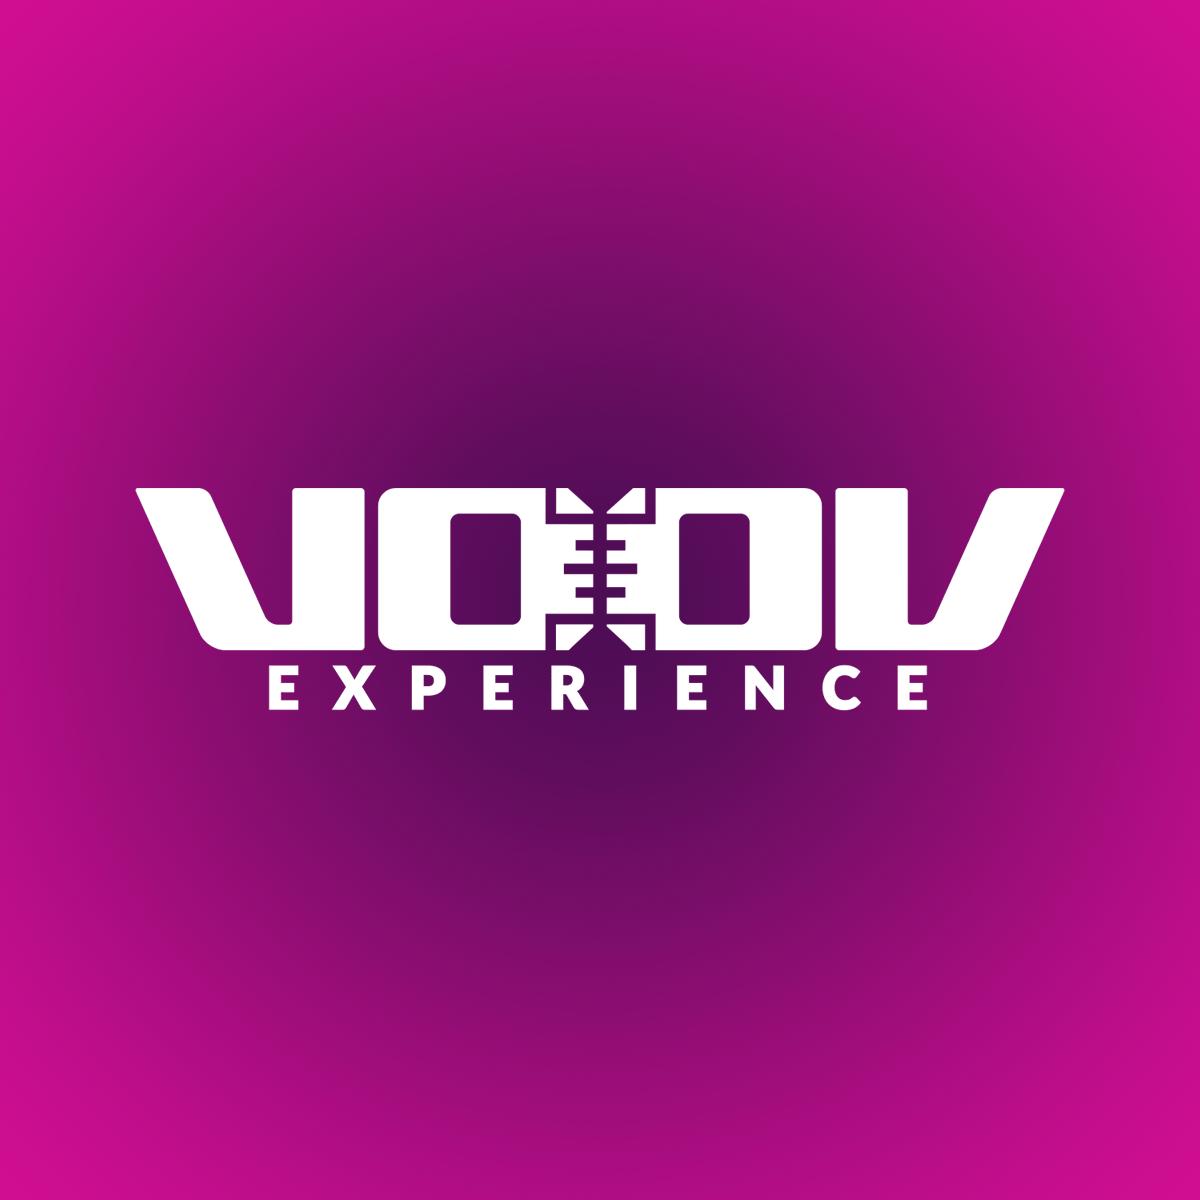 Voov Experience 2021